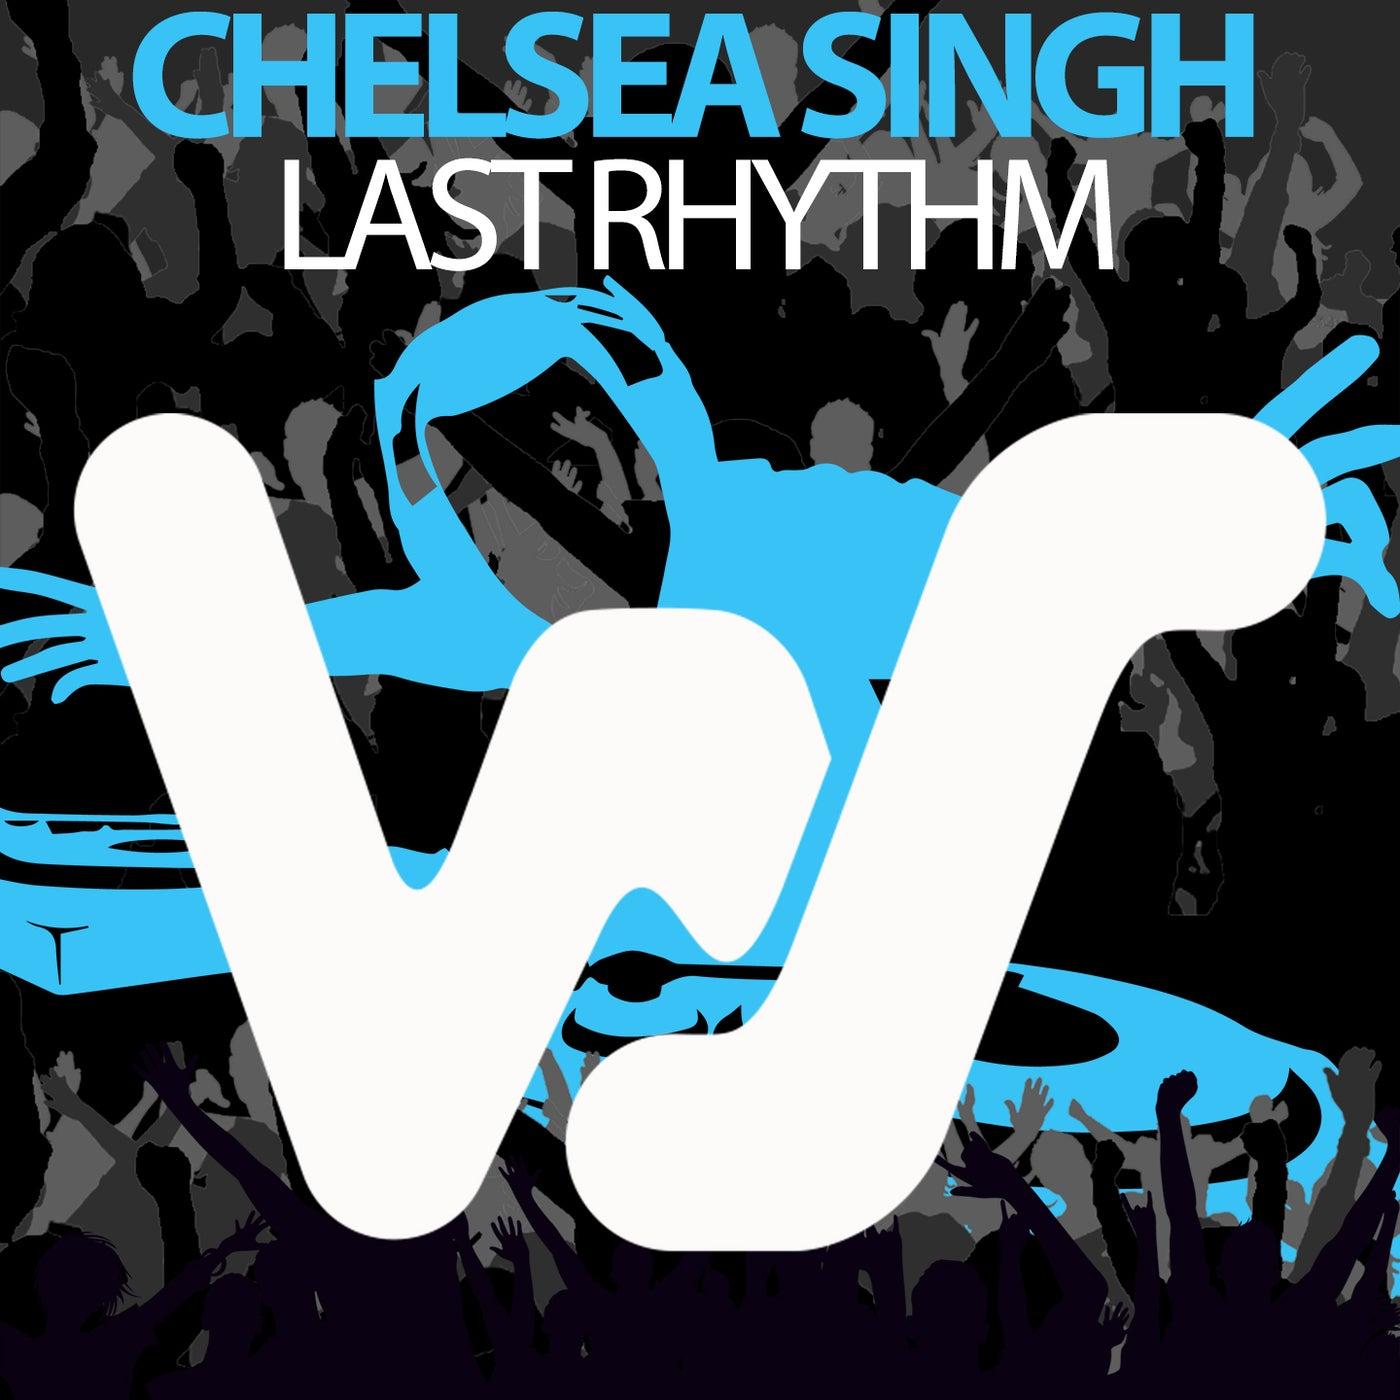 Last Rhythm (Original Mix)